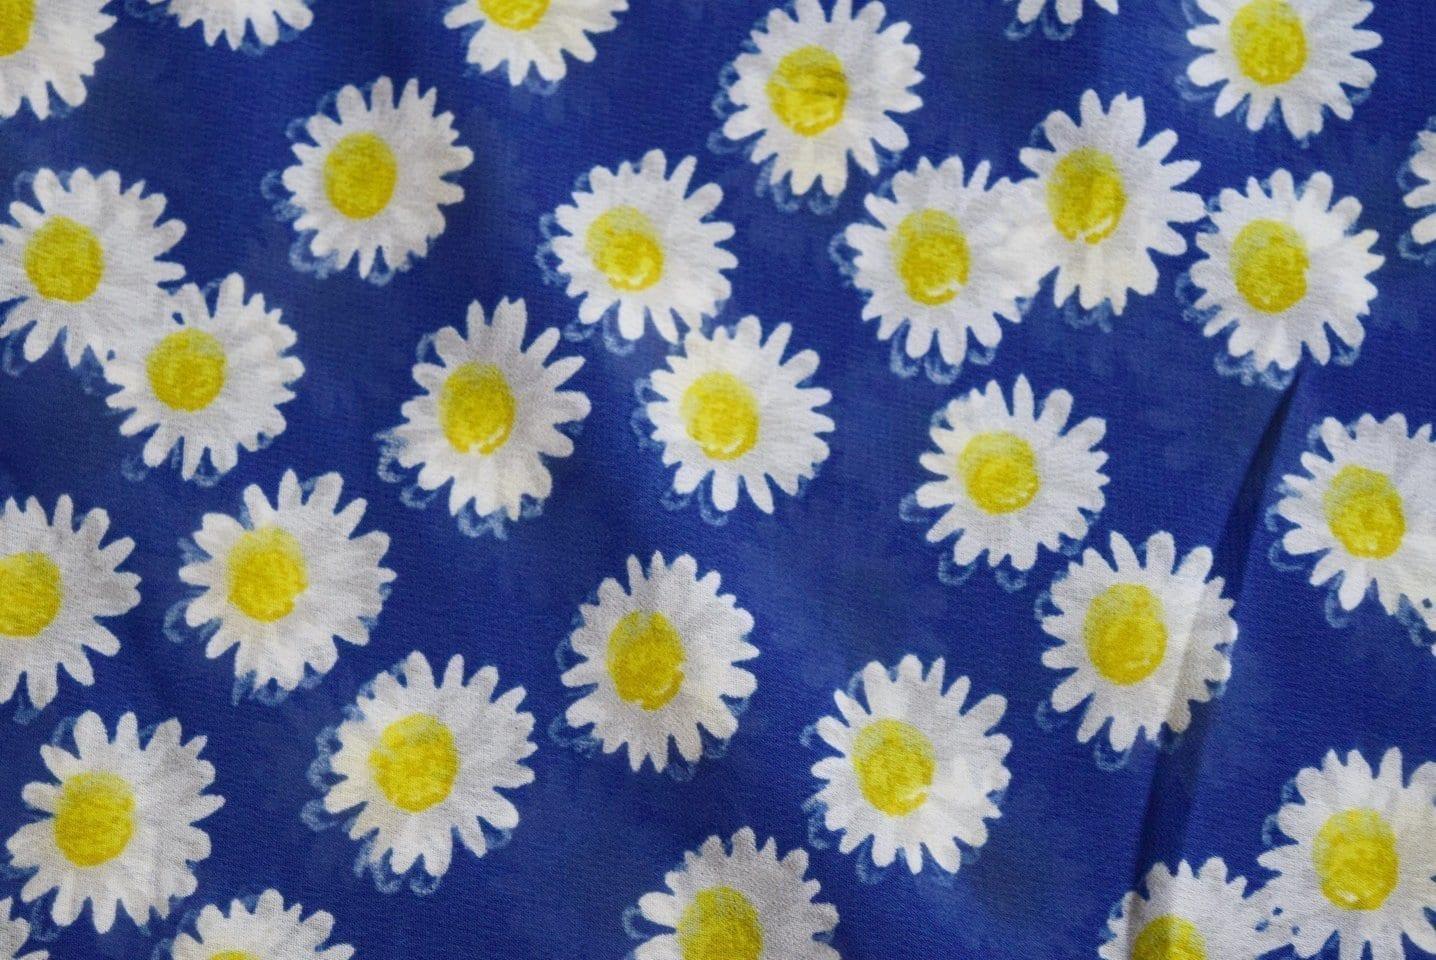 GEORGETTE PRINTED fabric for Kurti, Saree, Salwar, Dupatta GF036 1